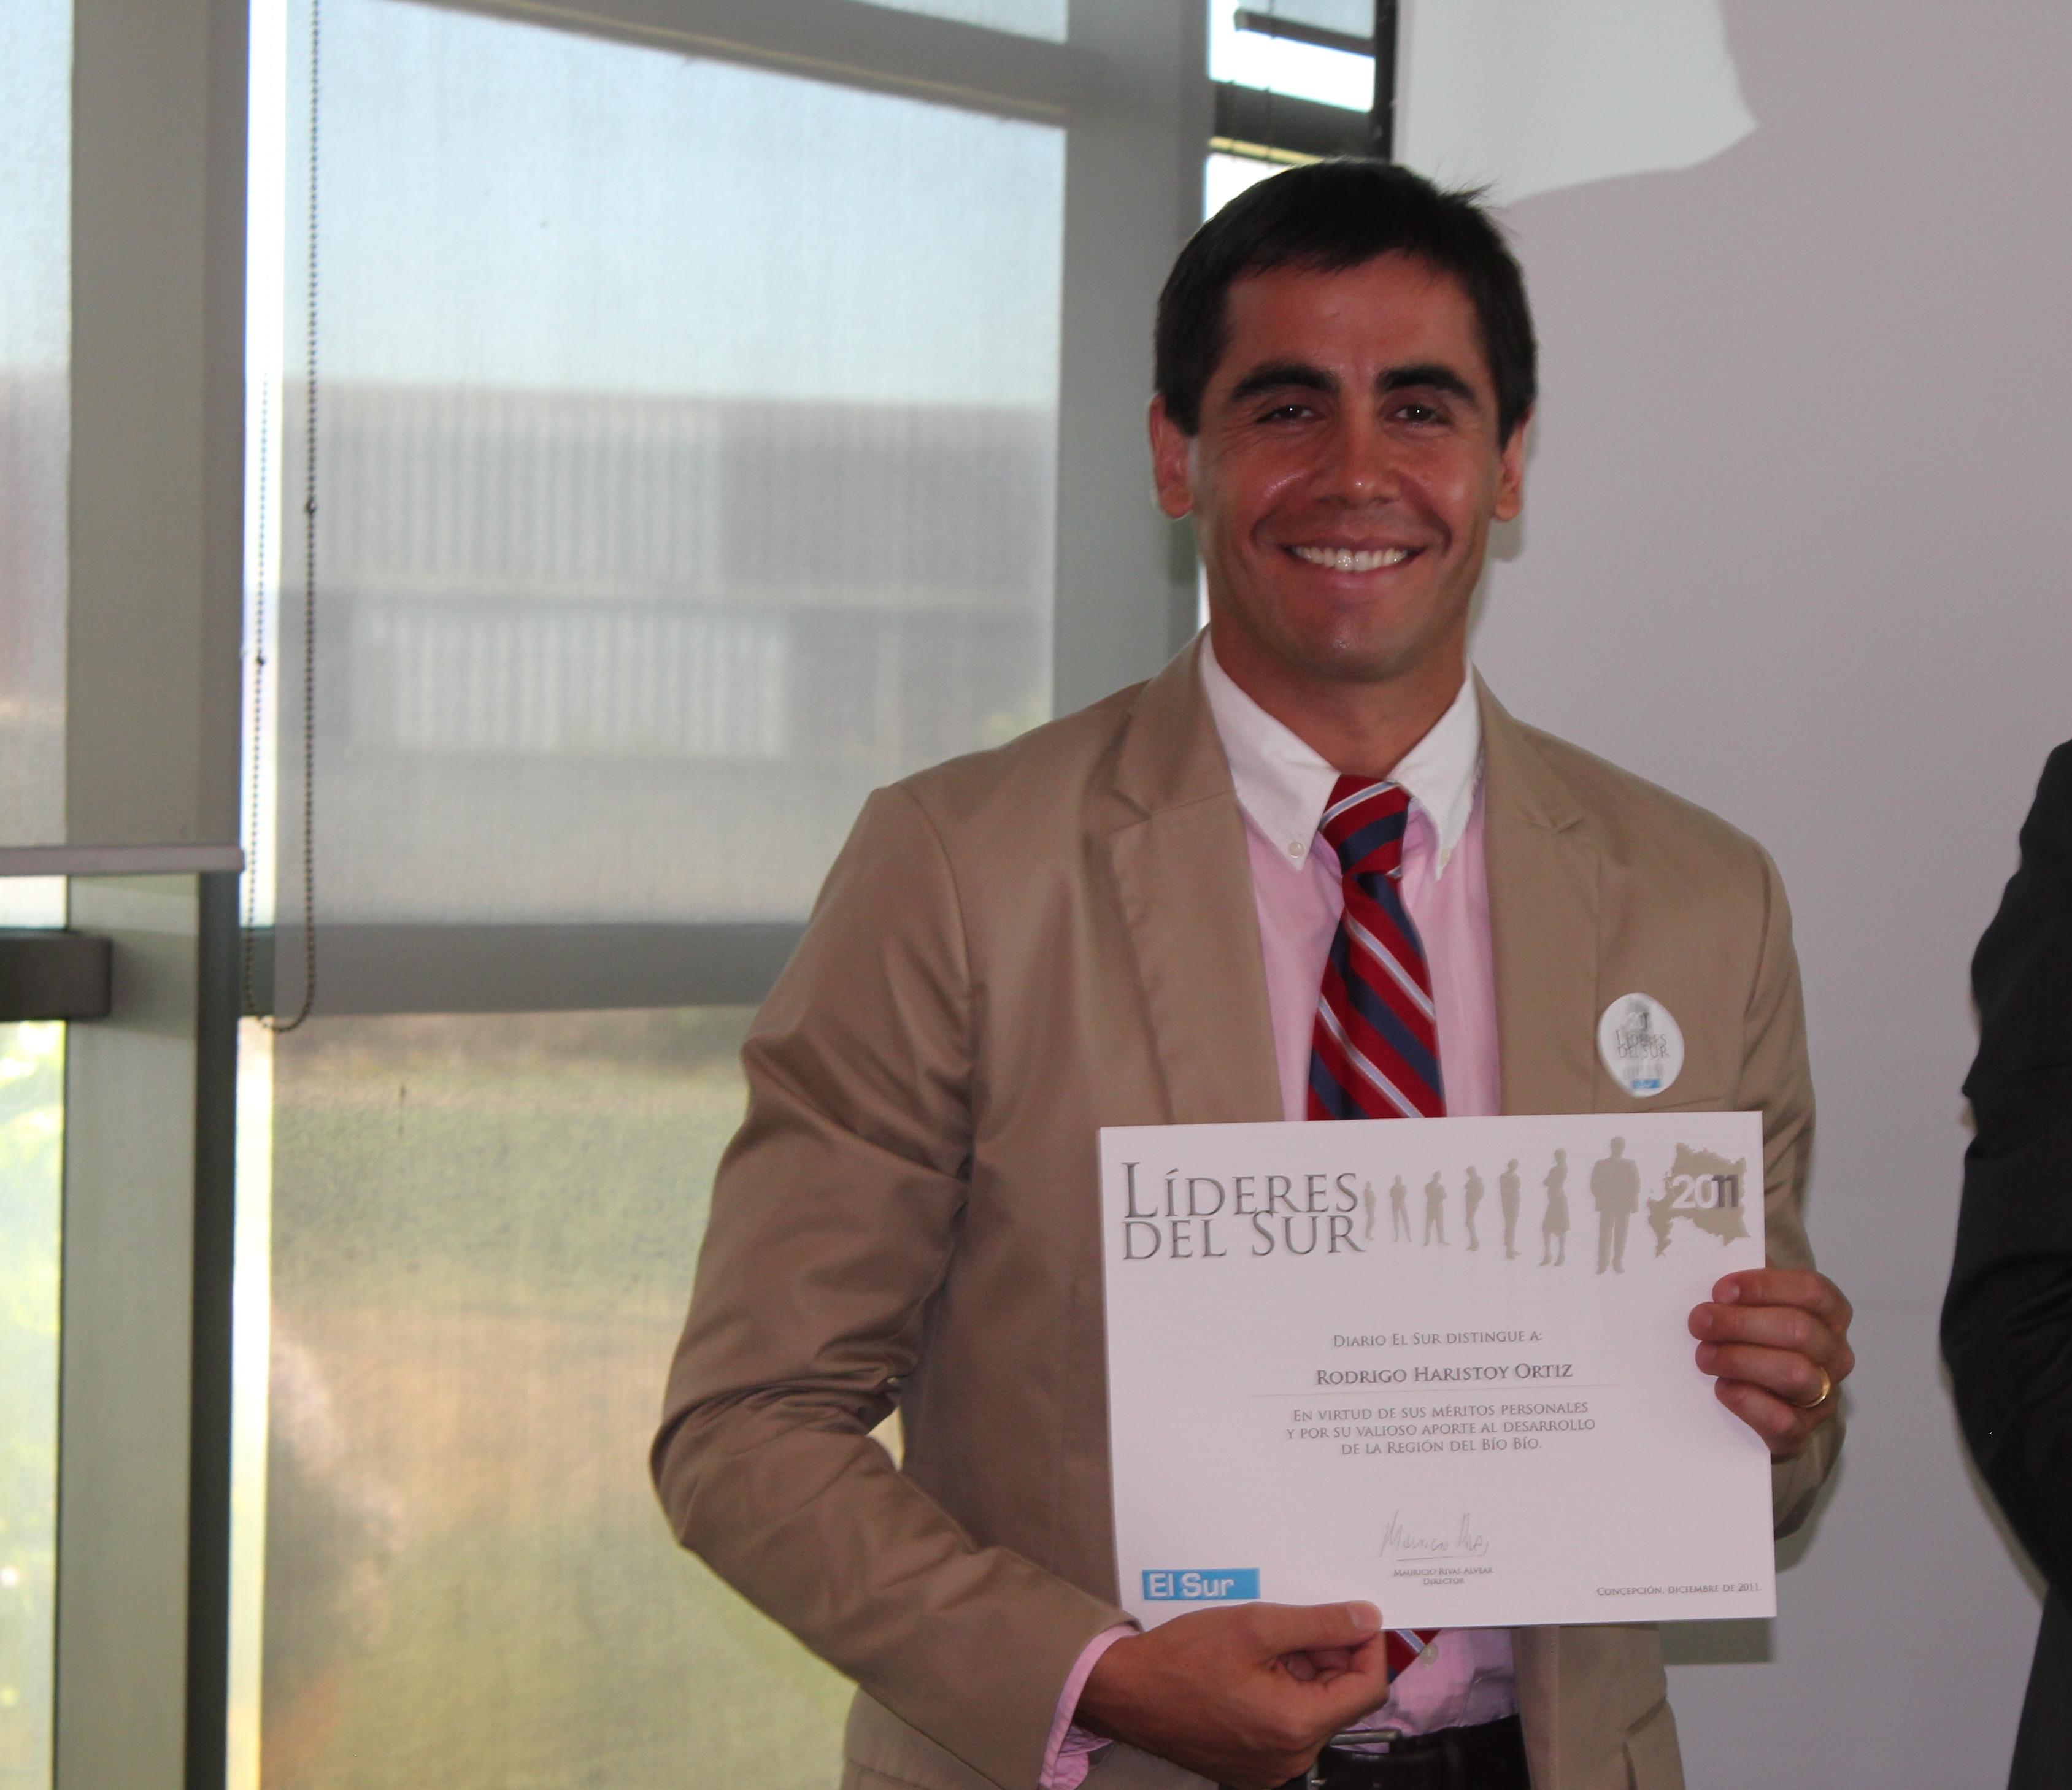 Dr. Rodrigo Haristoy